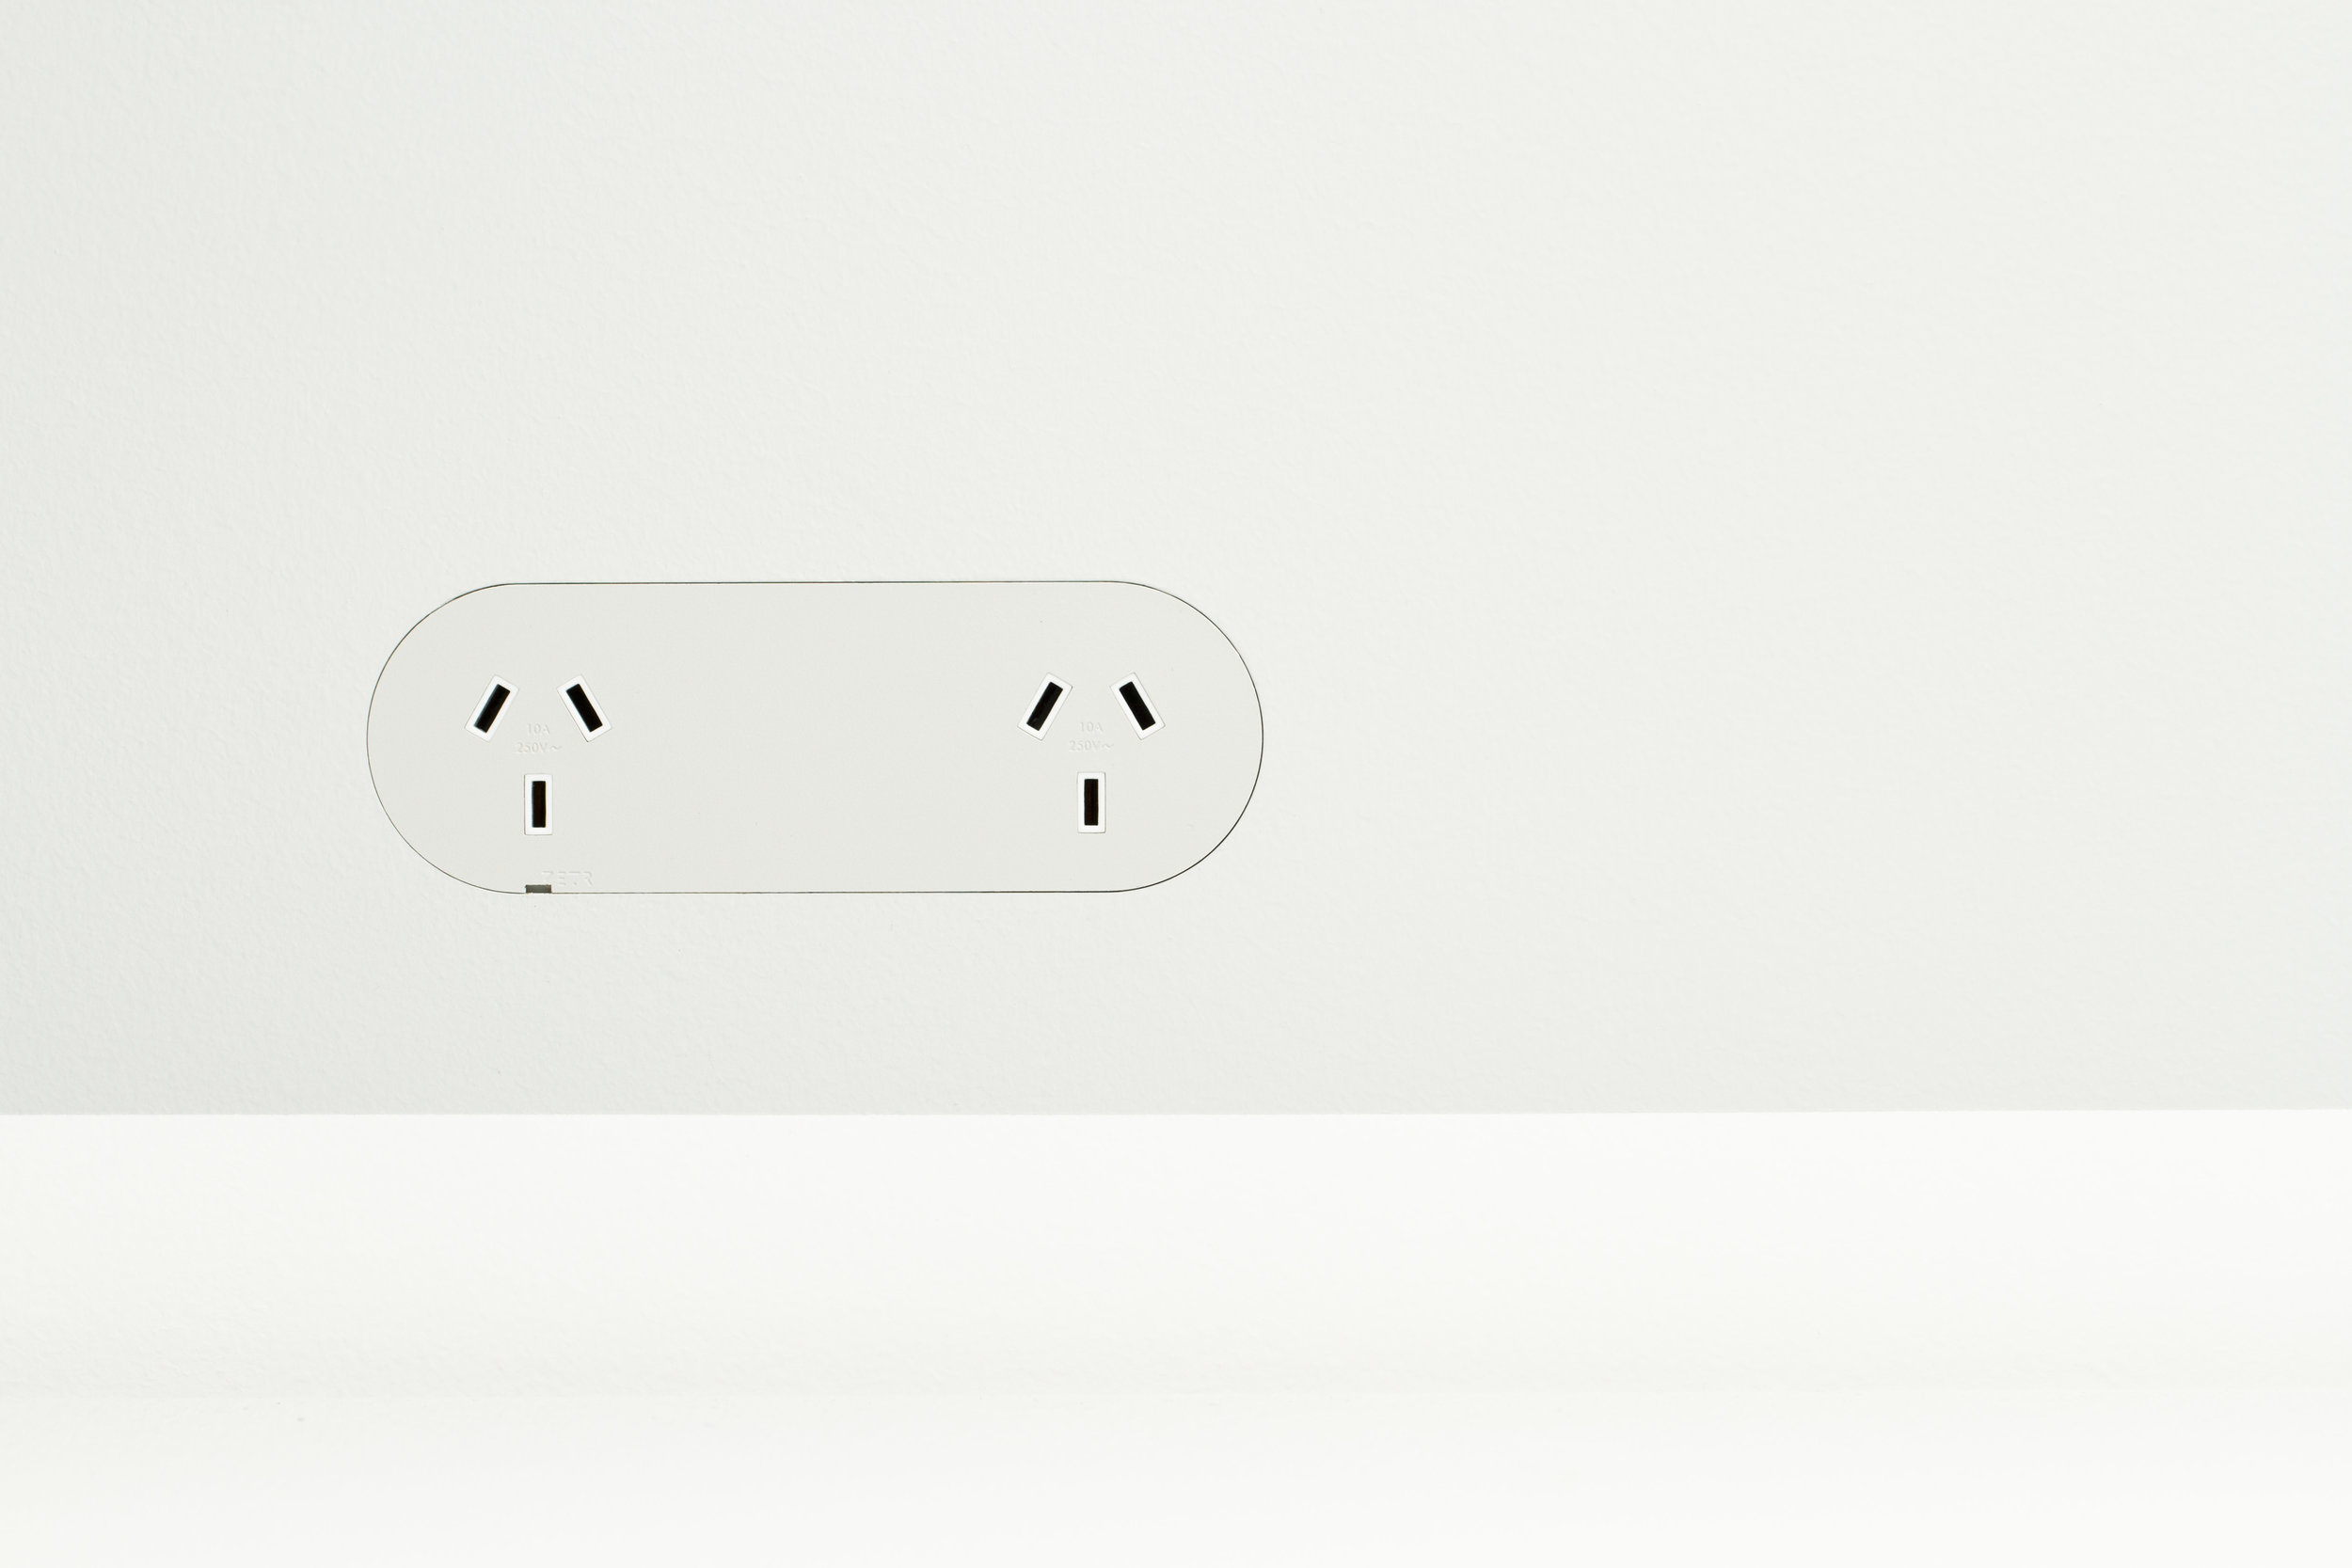 ZETR Double Outlet in Plasterboard